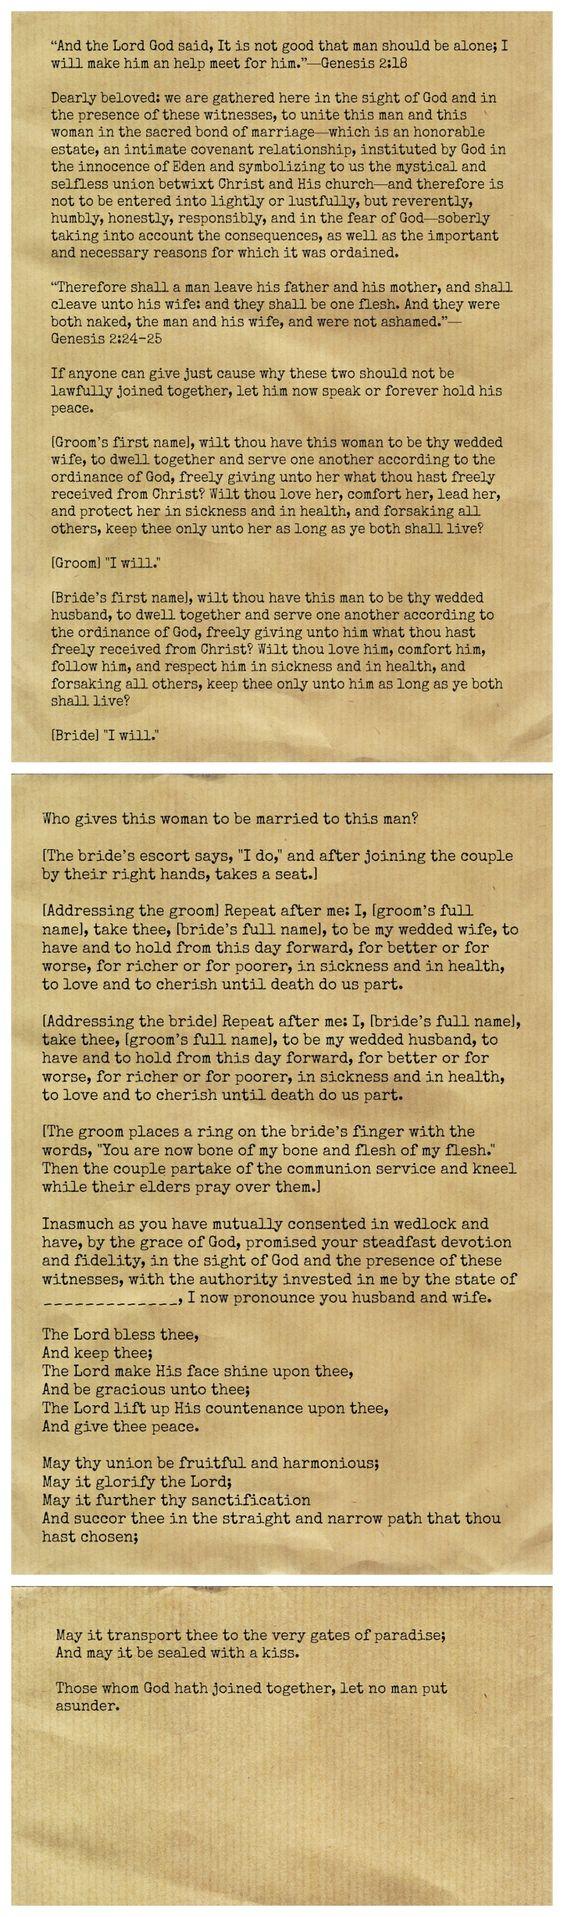 Christian Wedding Ceremony Christian Weddings And Wedding Ceremonies On Pinterest